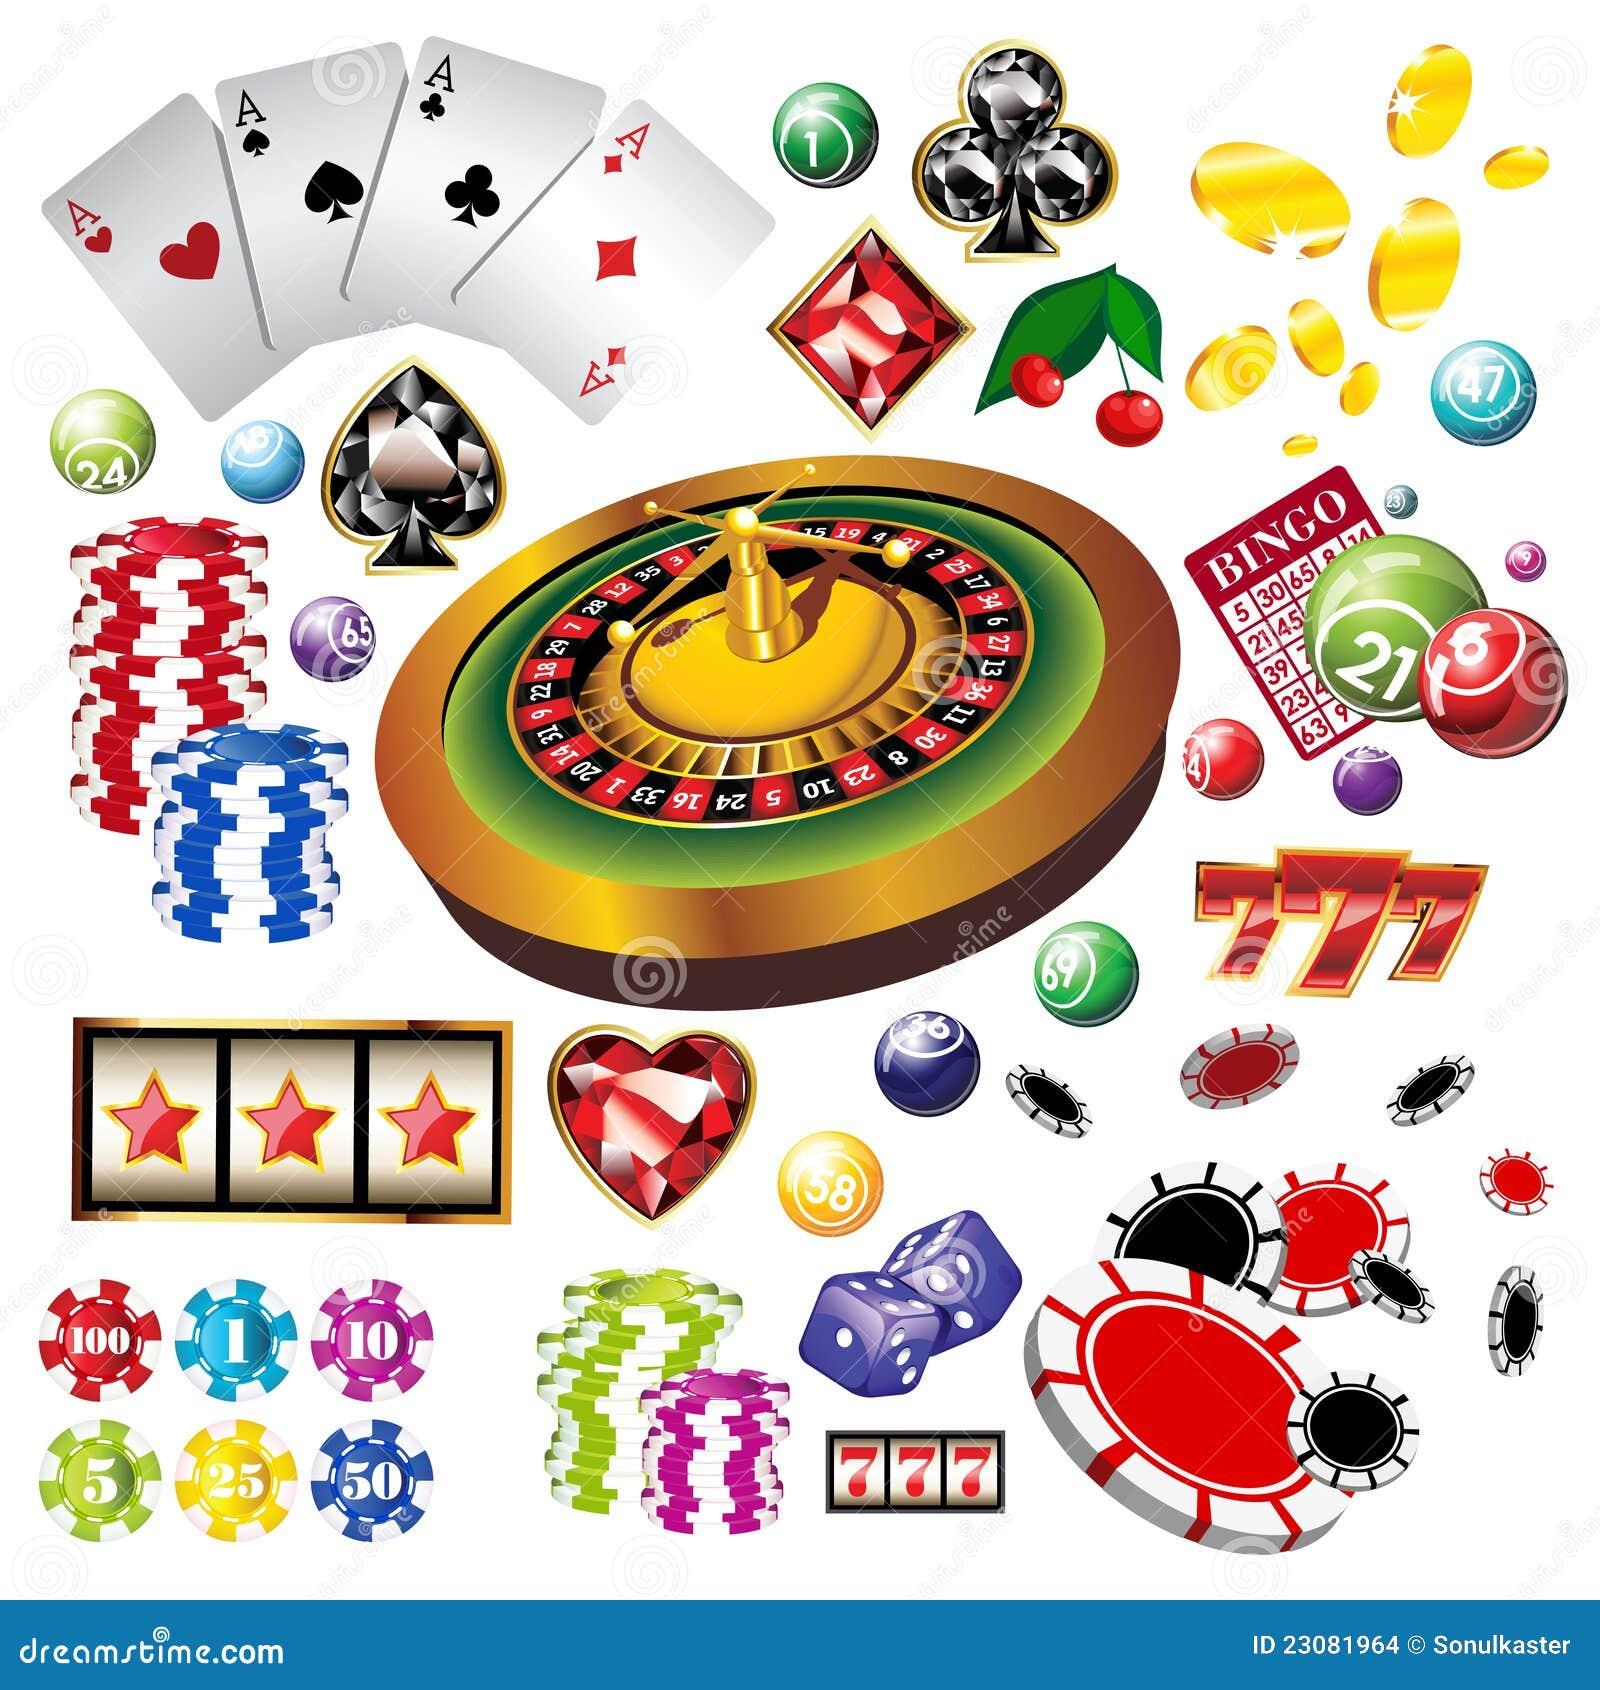 kazino-ruletka-elementi-v-png